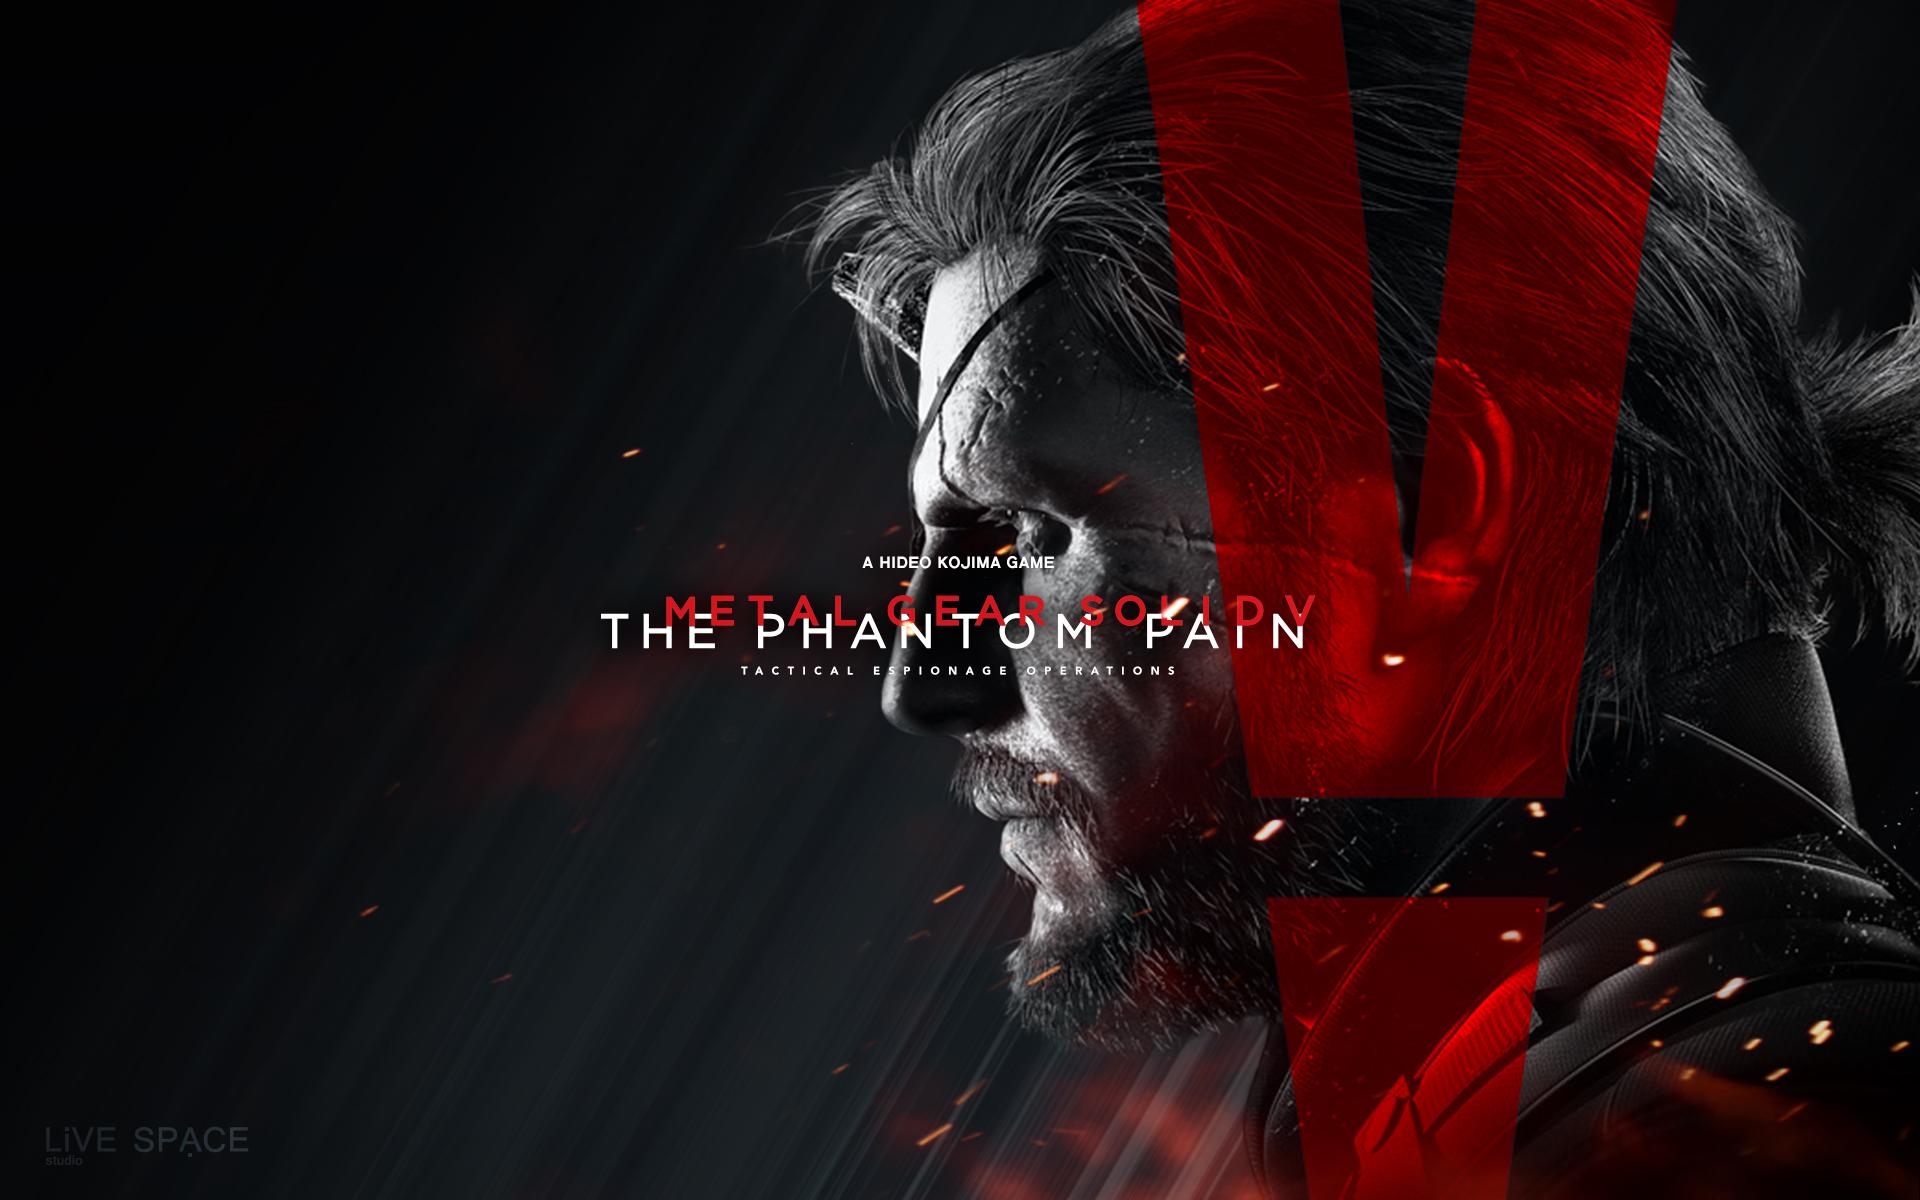 LS Metal Gear Solid V: The Phantom Pain